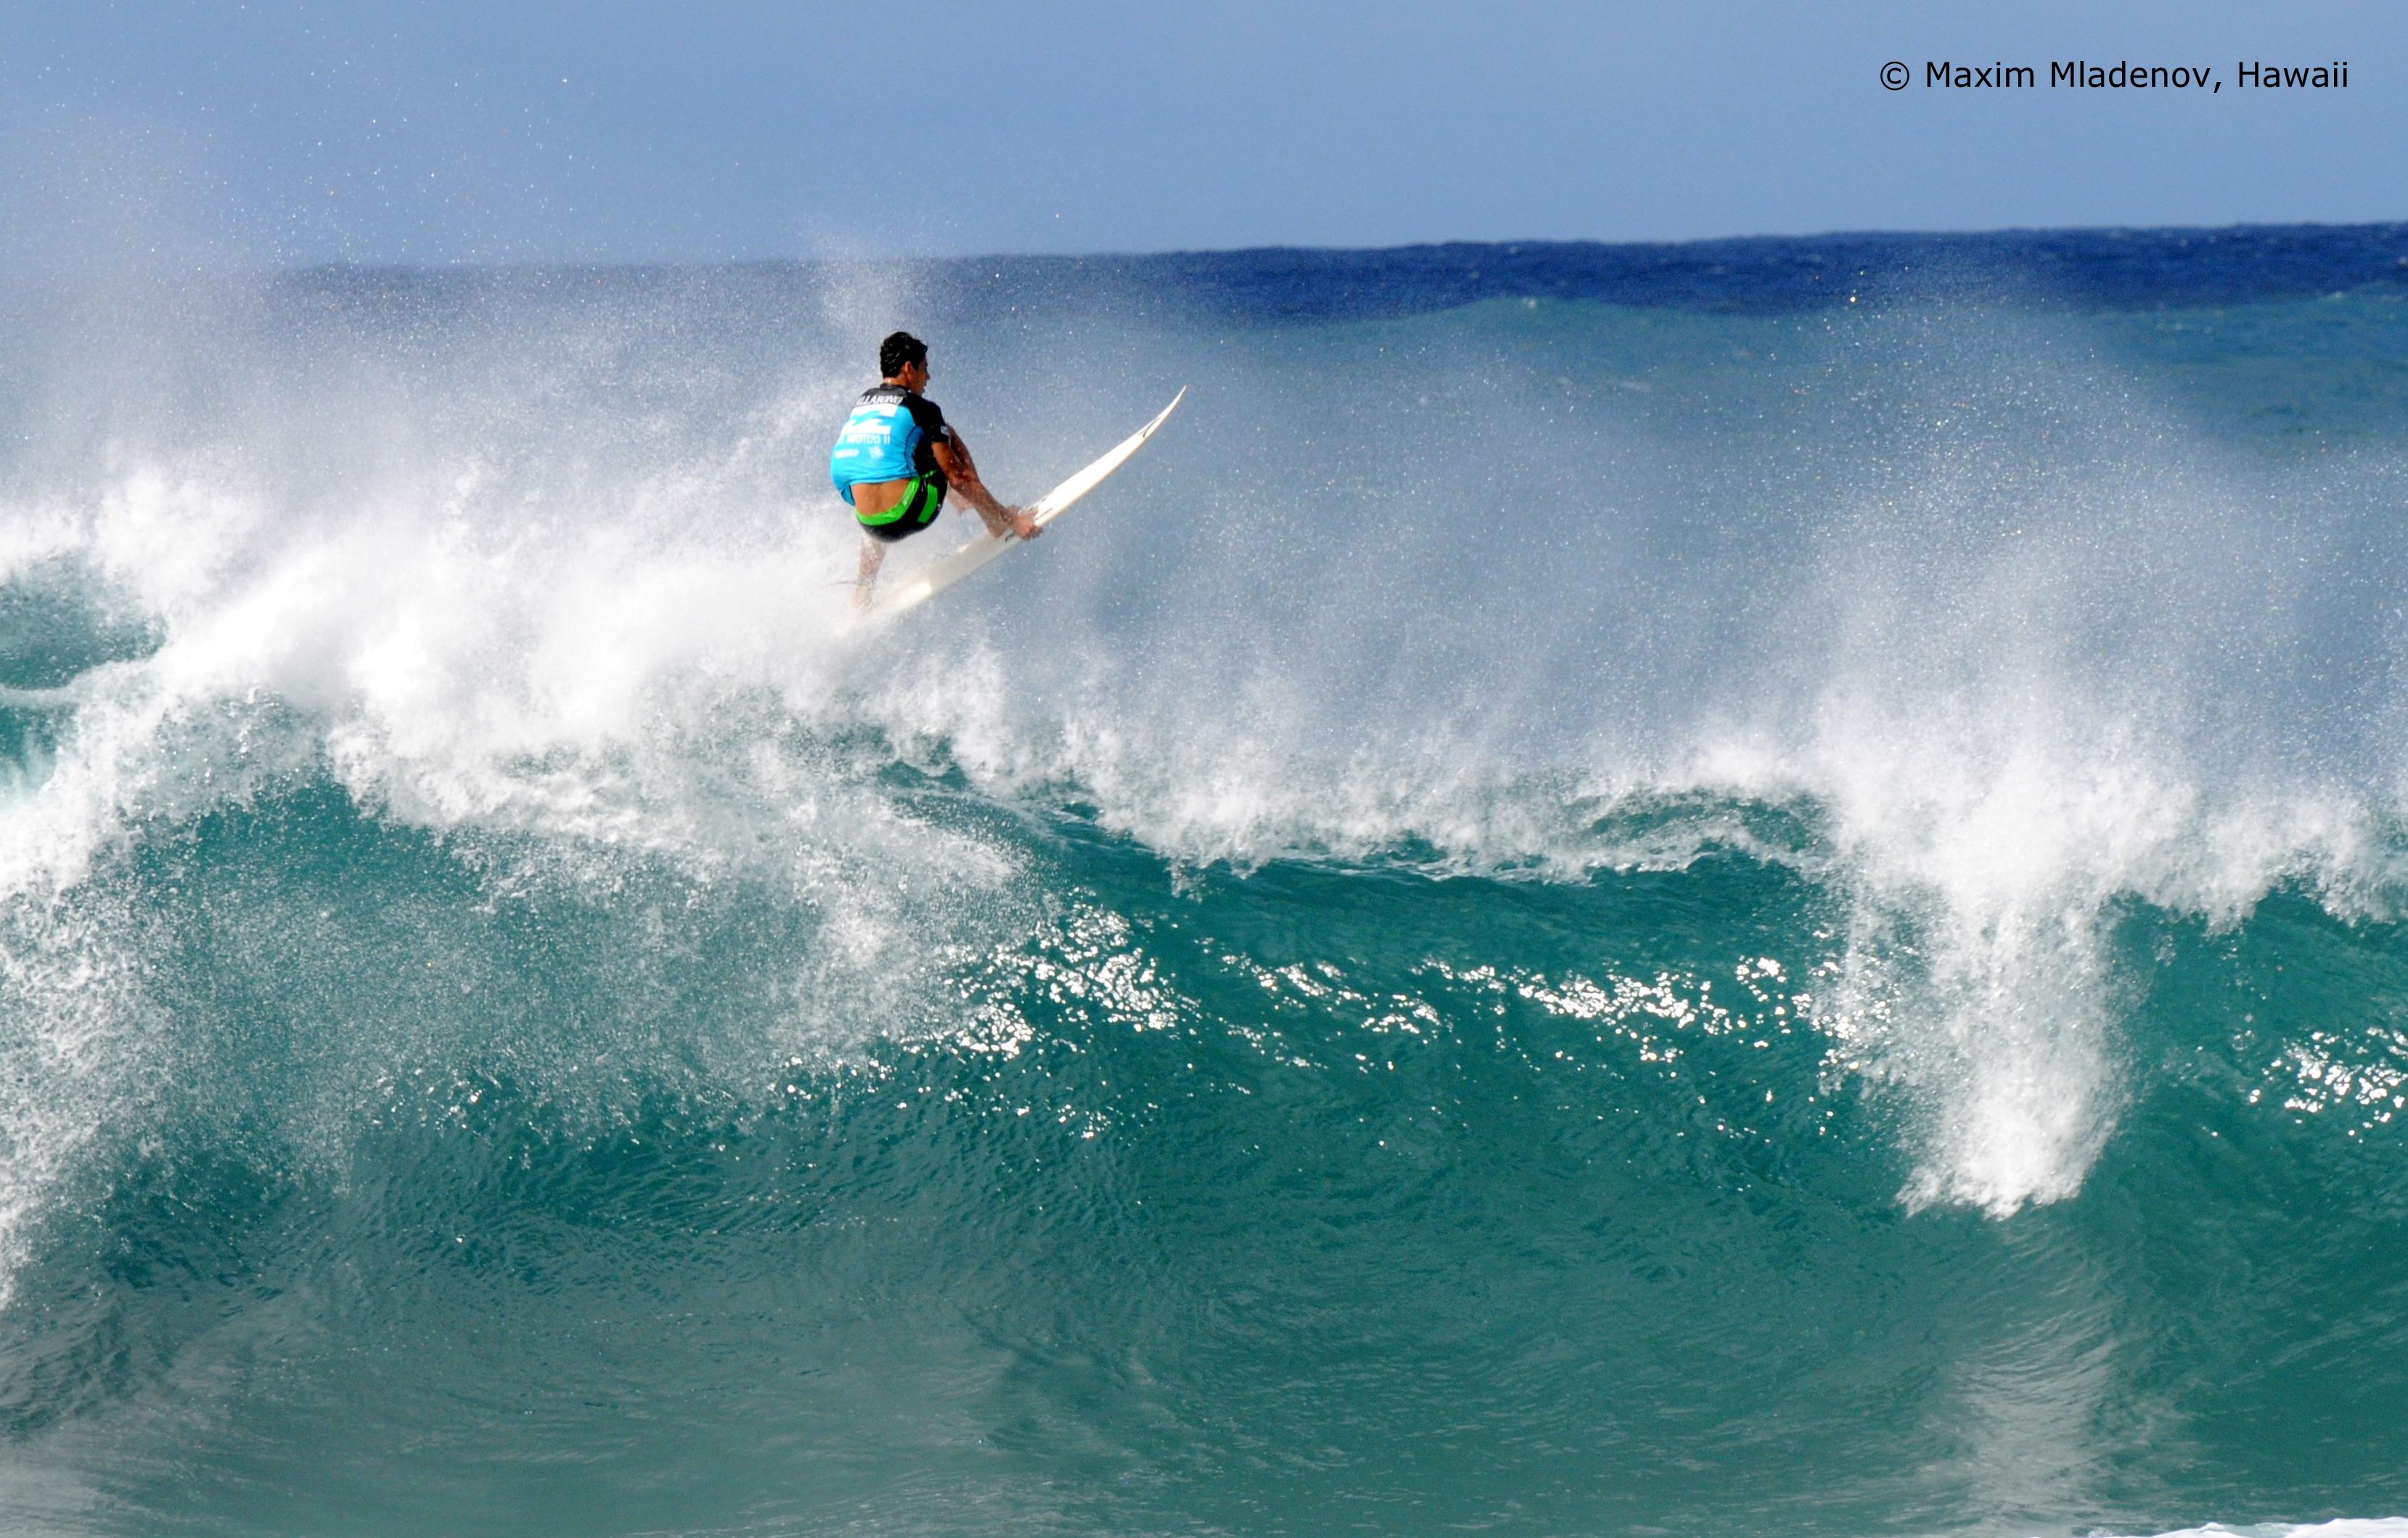 Free Fall -sequ06- 08-12-2011 Billabong Pipe Masters © Maxim Mladenov, Hawaii